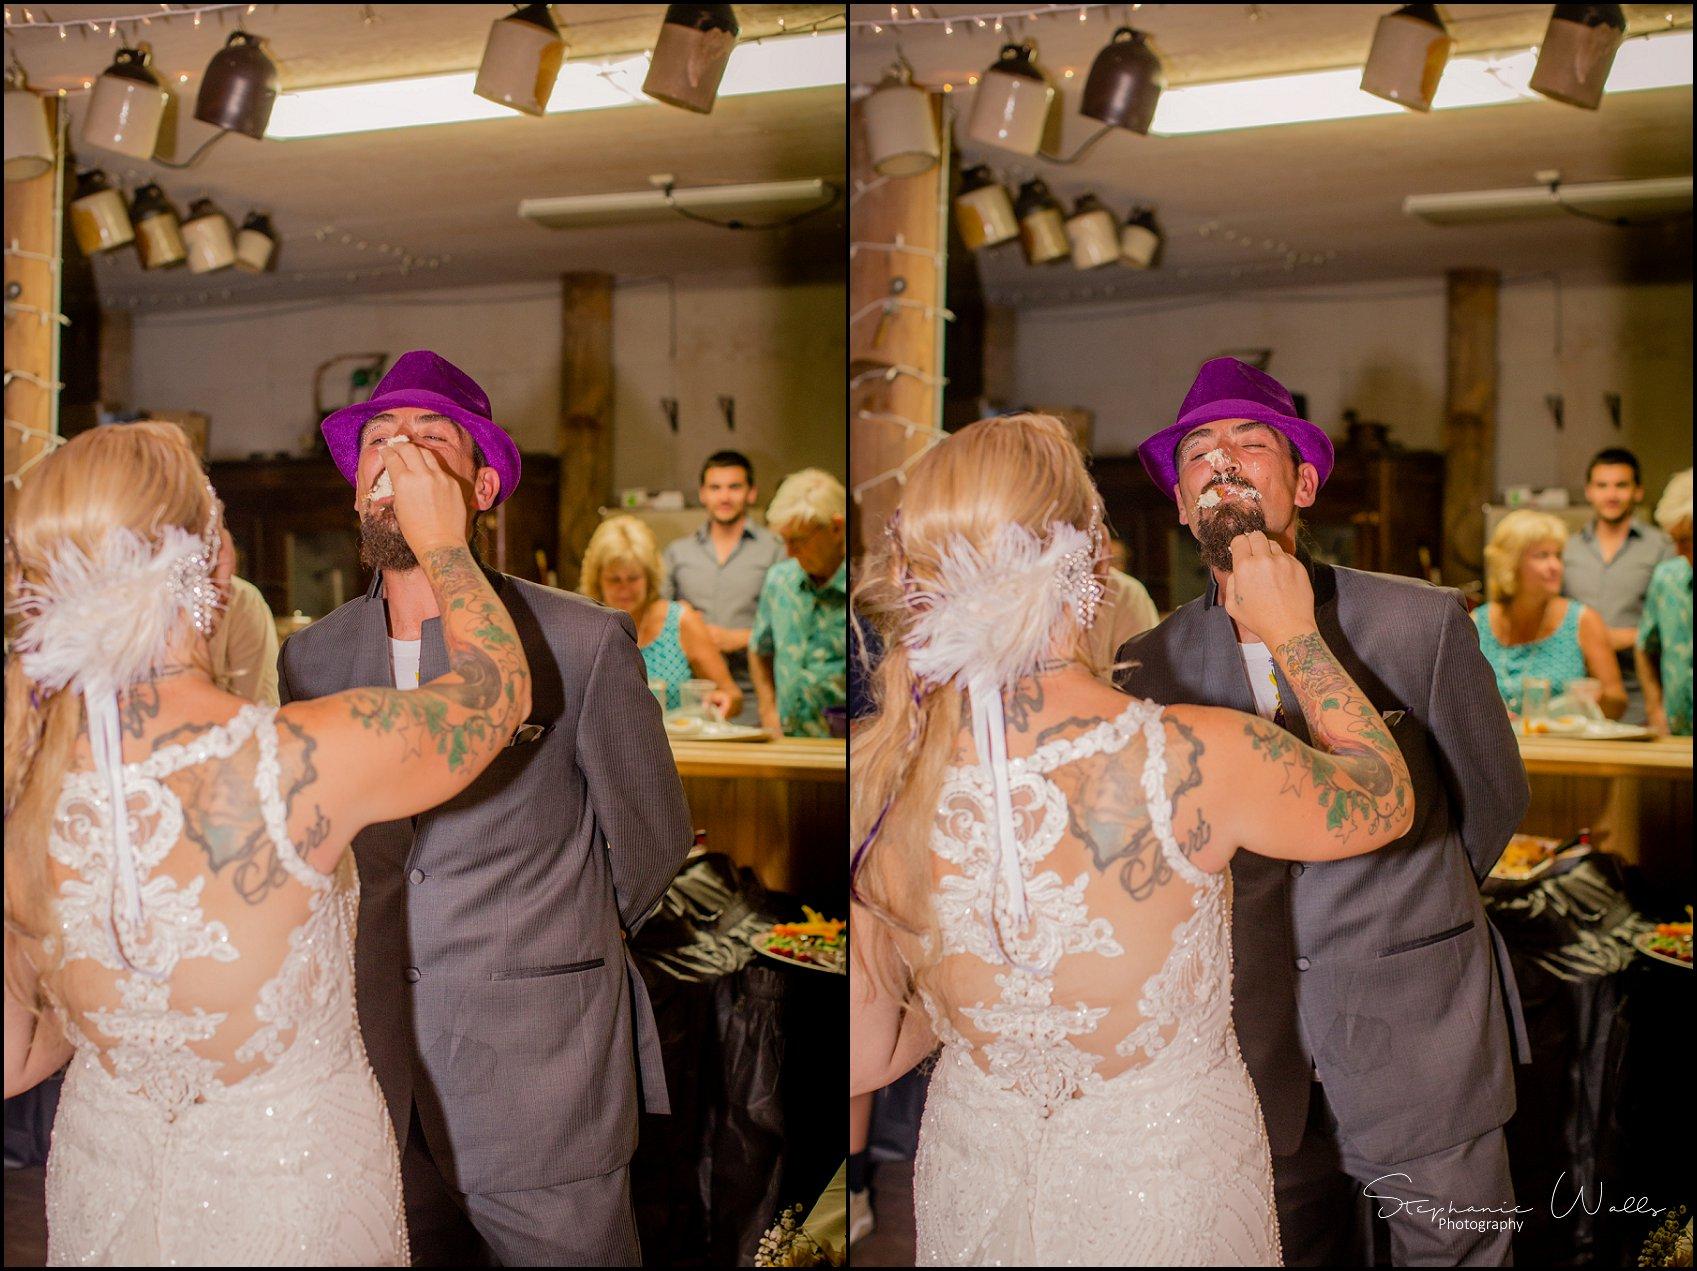 Everist Wedding 025 1 Patti & Bobbys | Troll Haven Castle & Bandy Farms | Sequim, Wa Wedding Photographer